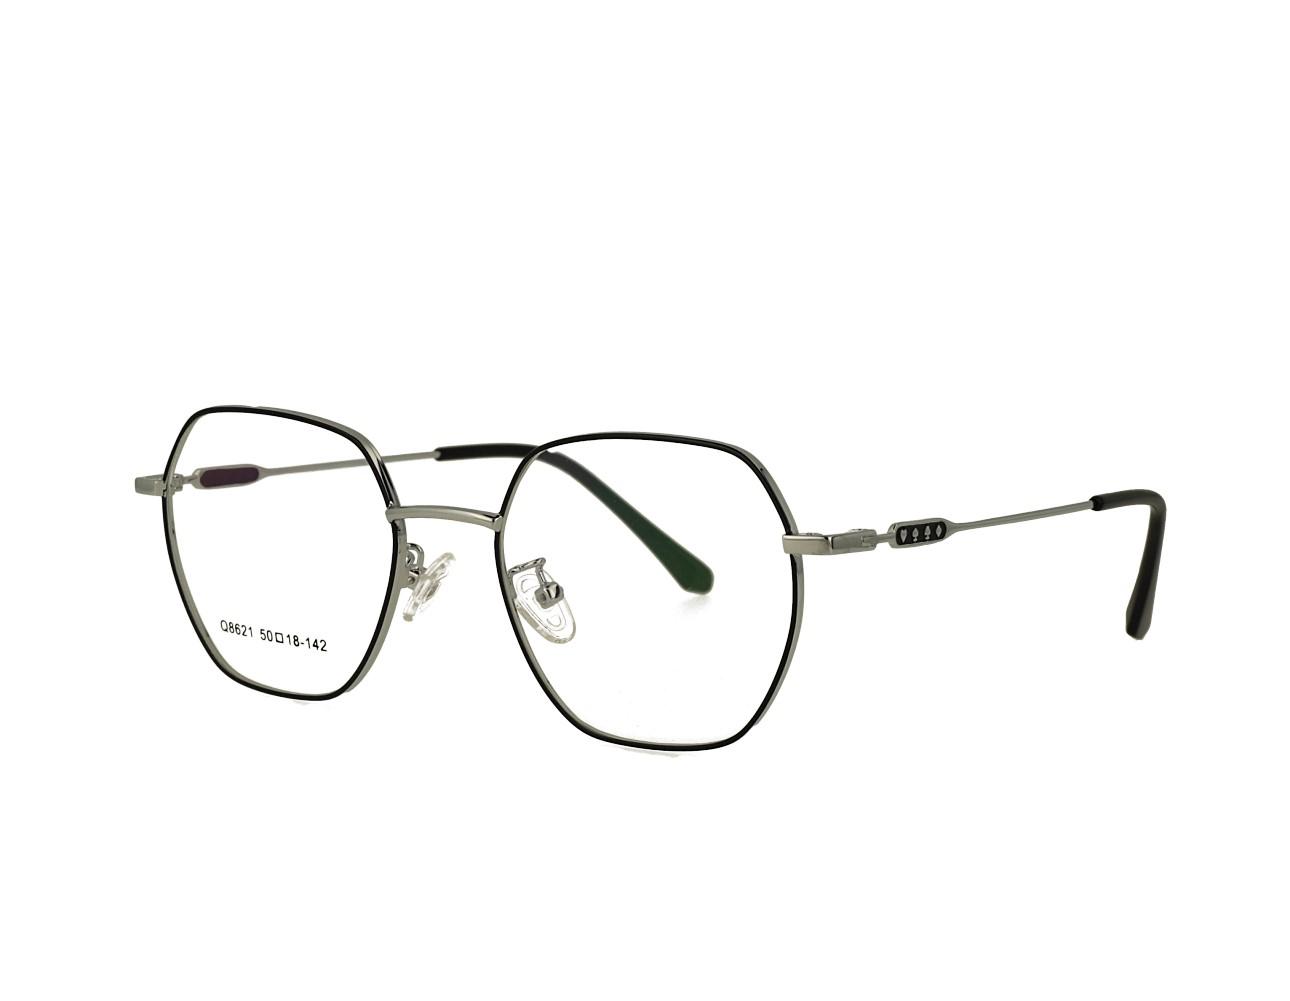 50 Size Hexagon Designer Optical frame Stainless Steal Eyeglasses Unisex Eyewear